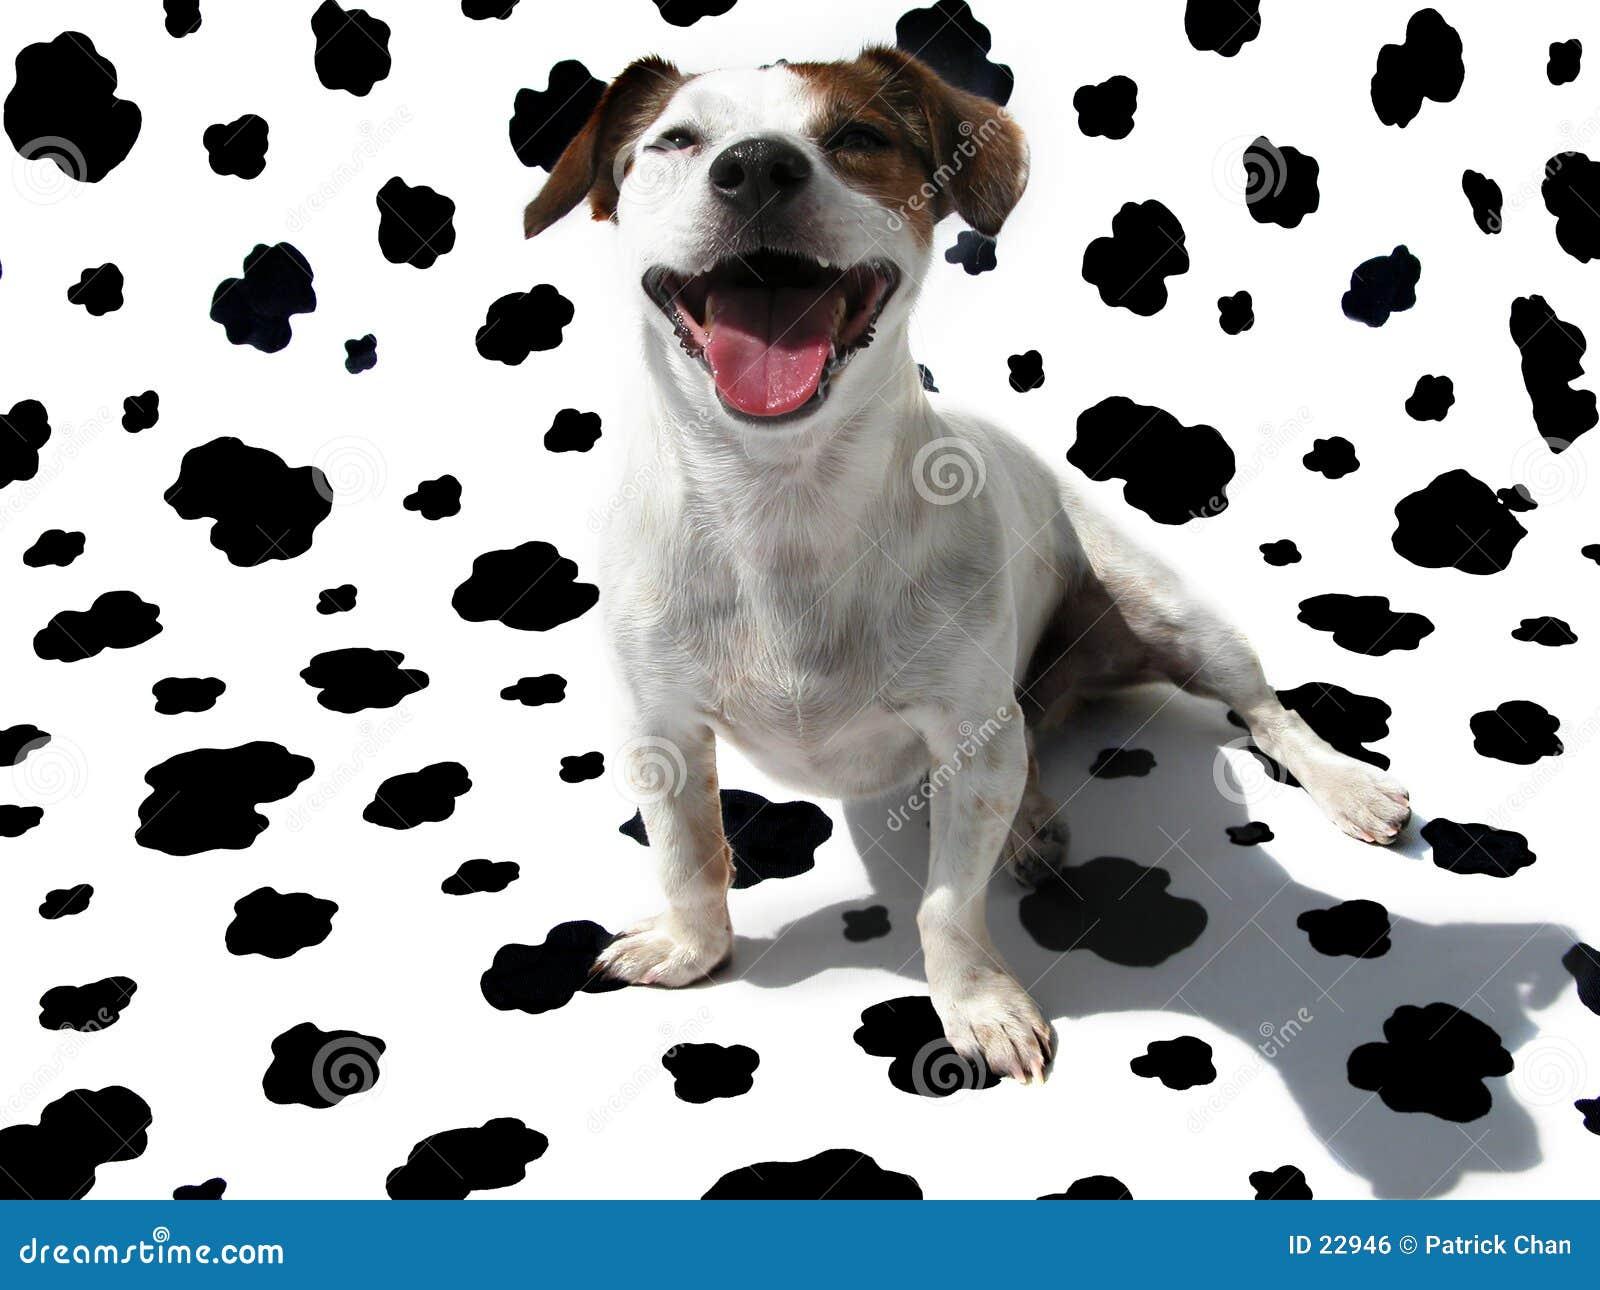 Terrier JRT de Gato Russell en lona de la vaca